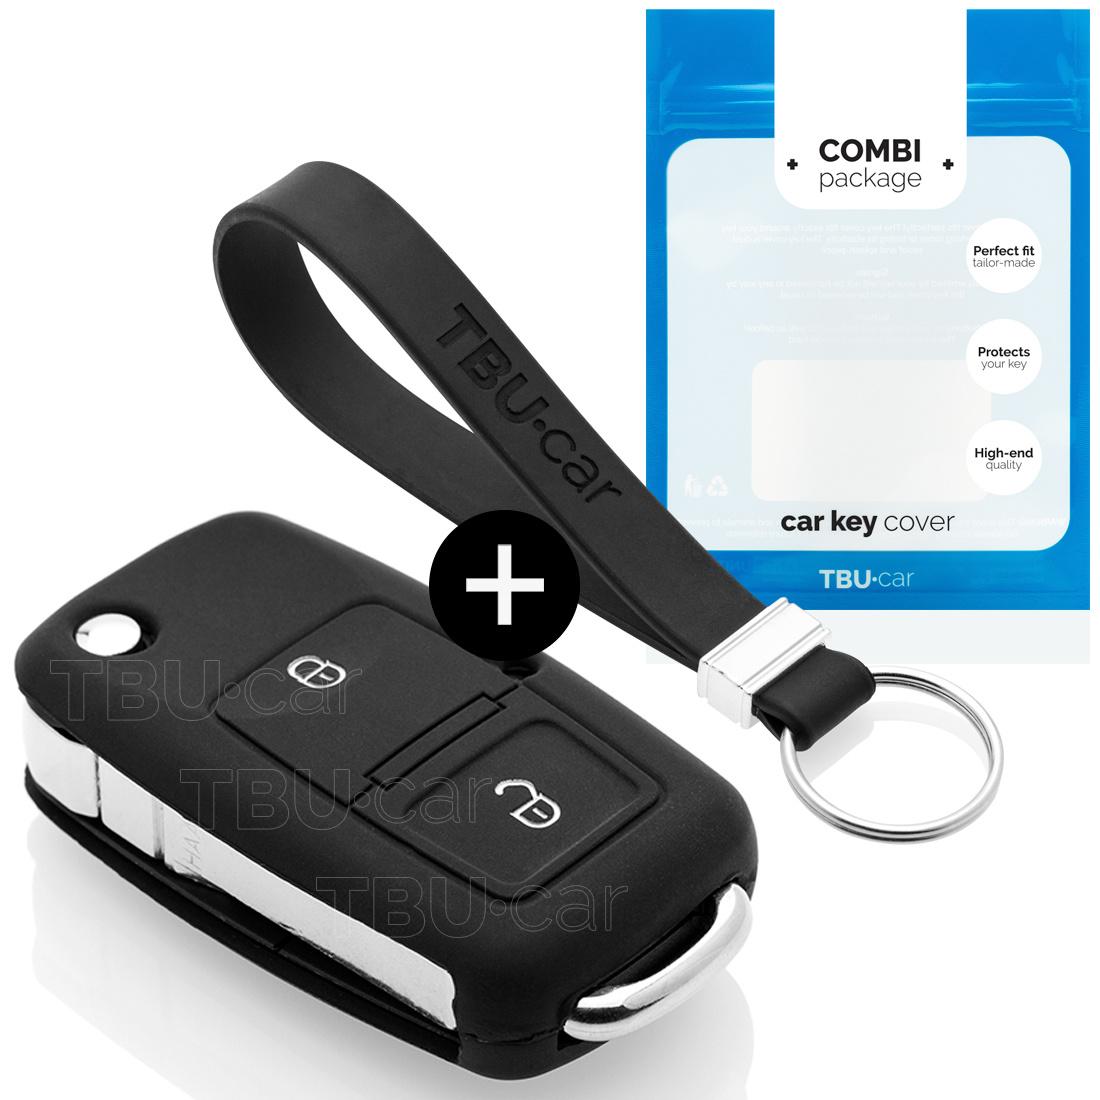 TBU car TBU car Autoschlüssel Hülle kompatibel mit Audi 2 Tasten - Schutzhülle aus Silikon - Auto Schlüsselhülle Cover in Schwarz